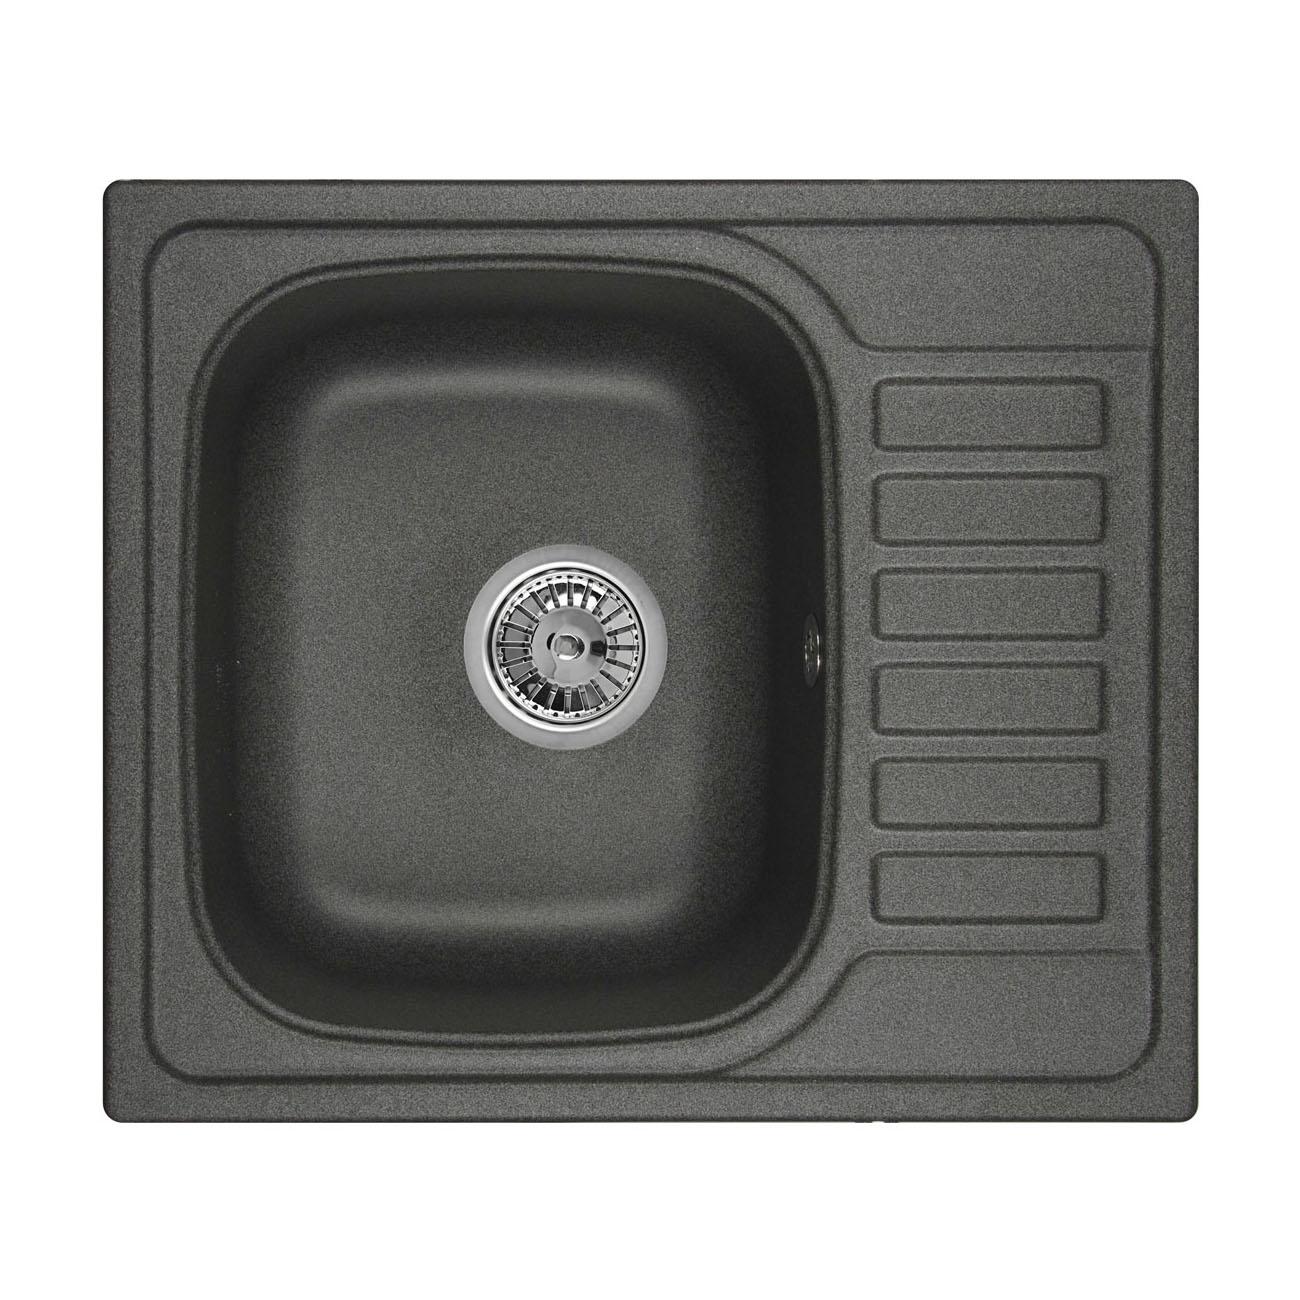 Кухонная мойка Granula GR-5801 575х495 графит кухонная мойка teka classic 1b 1 2d microtex